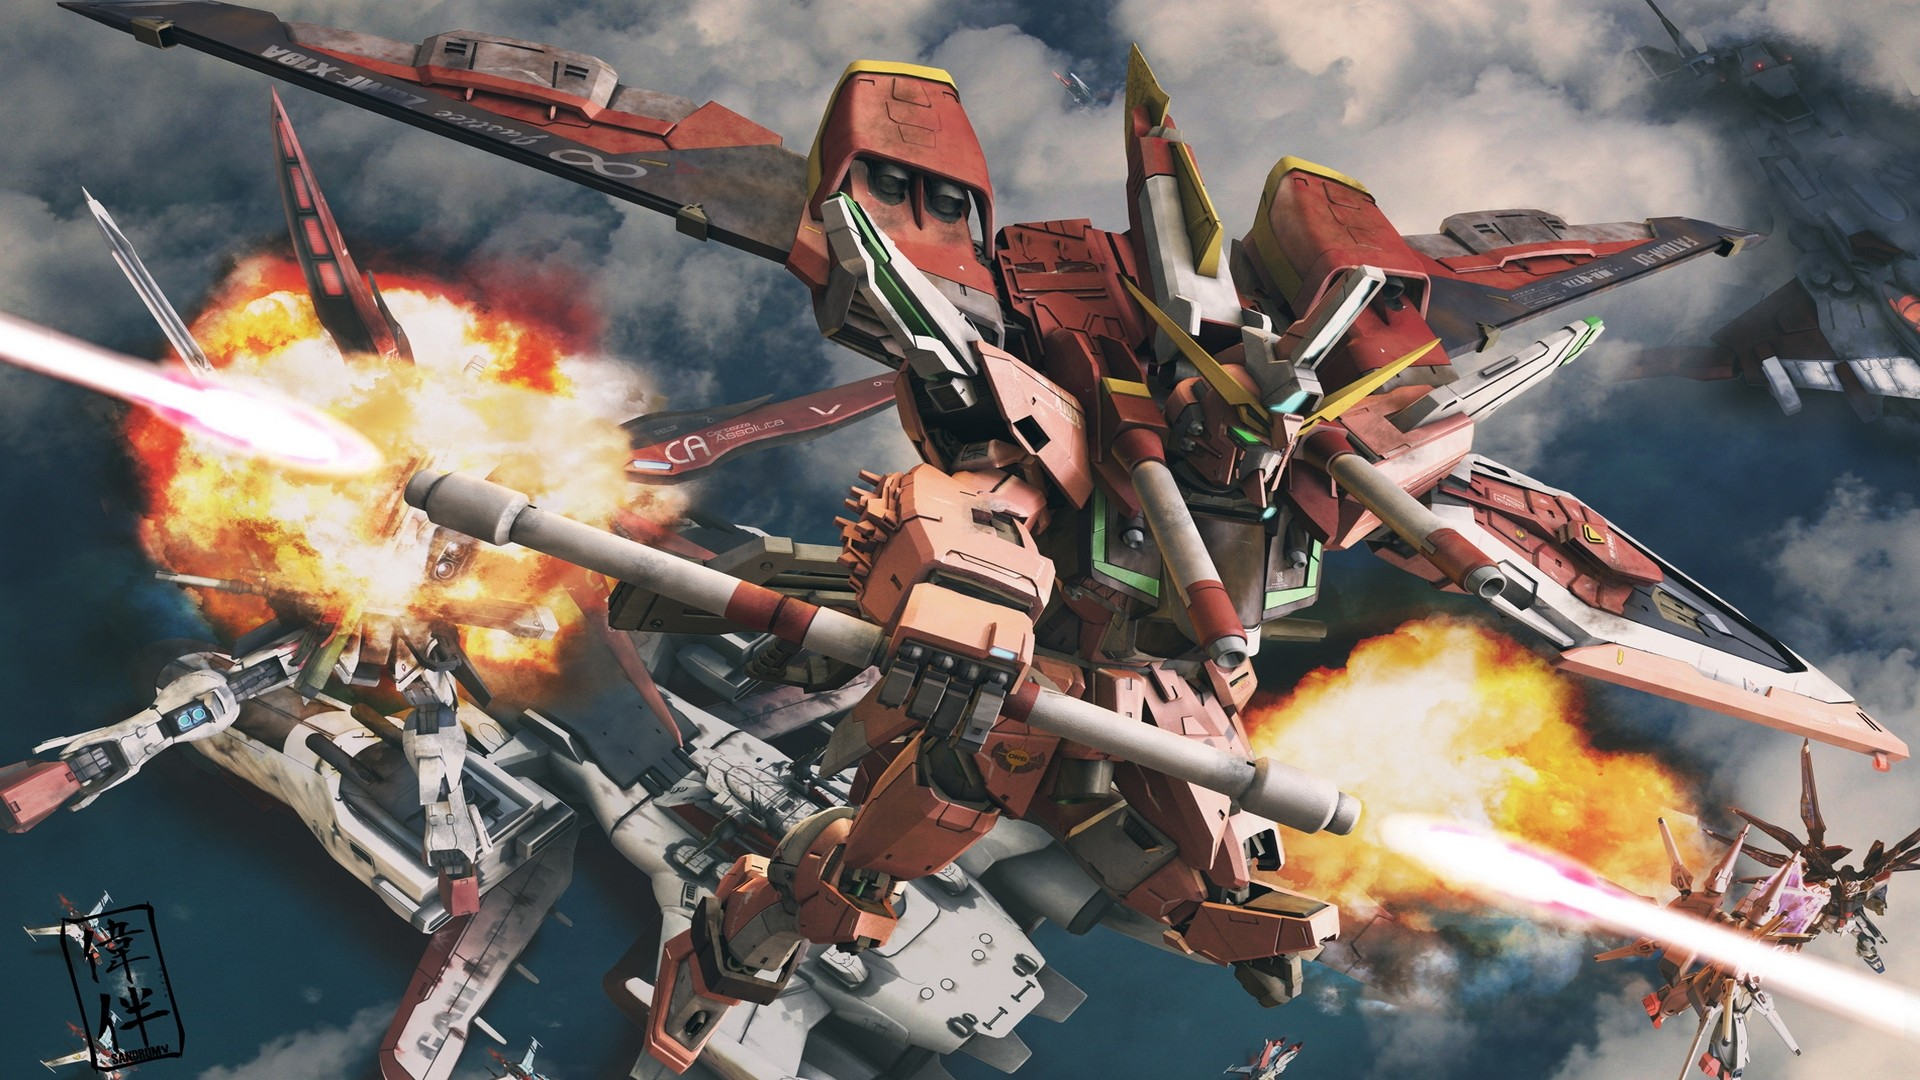 Gundam Wallpaper Download Full